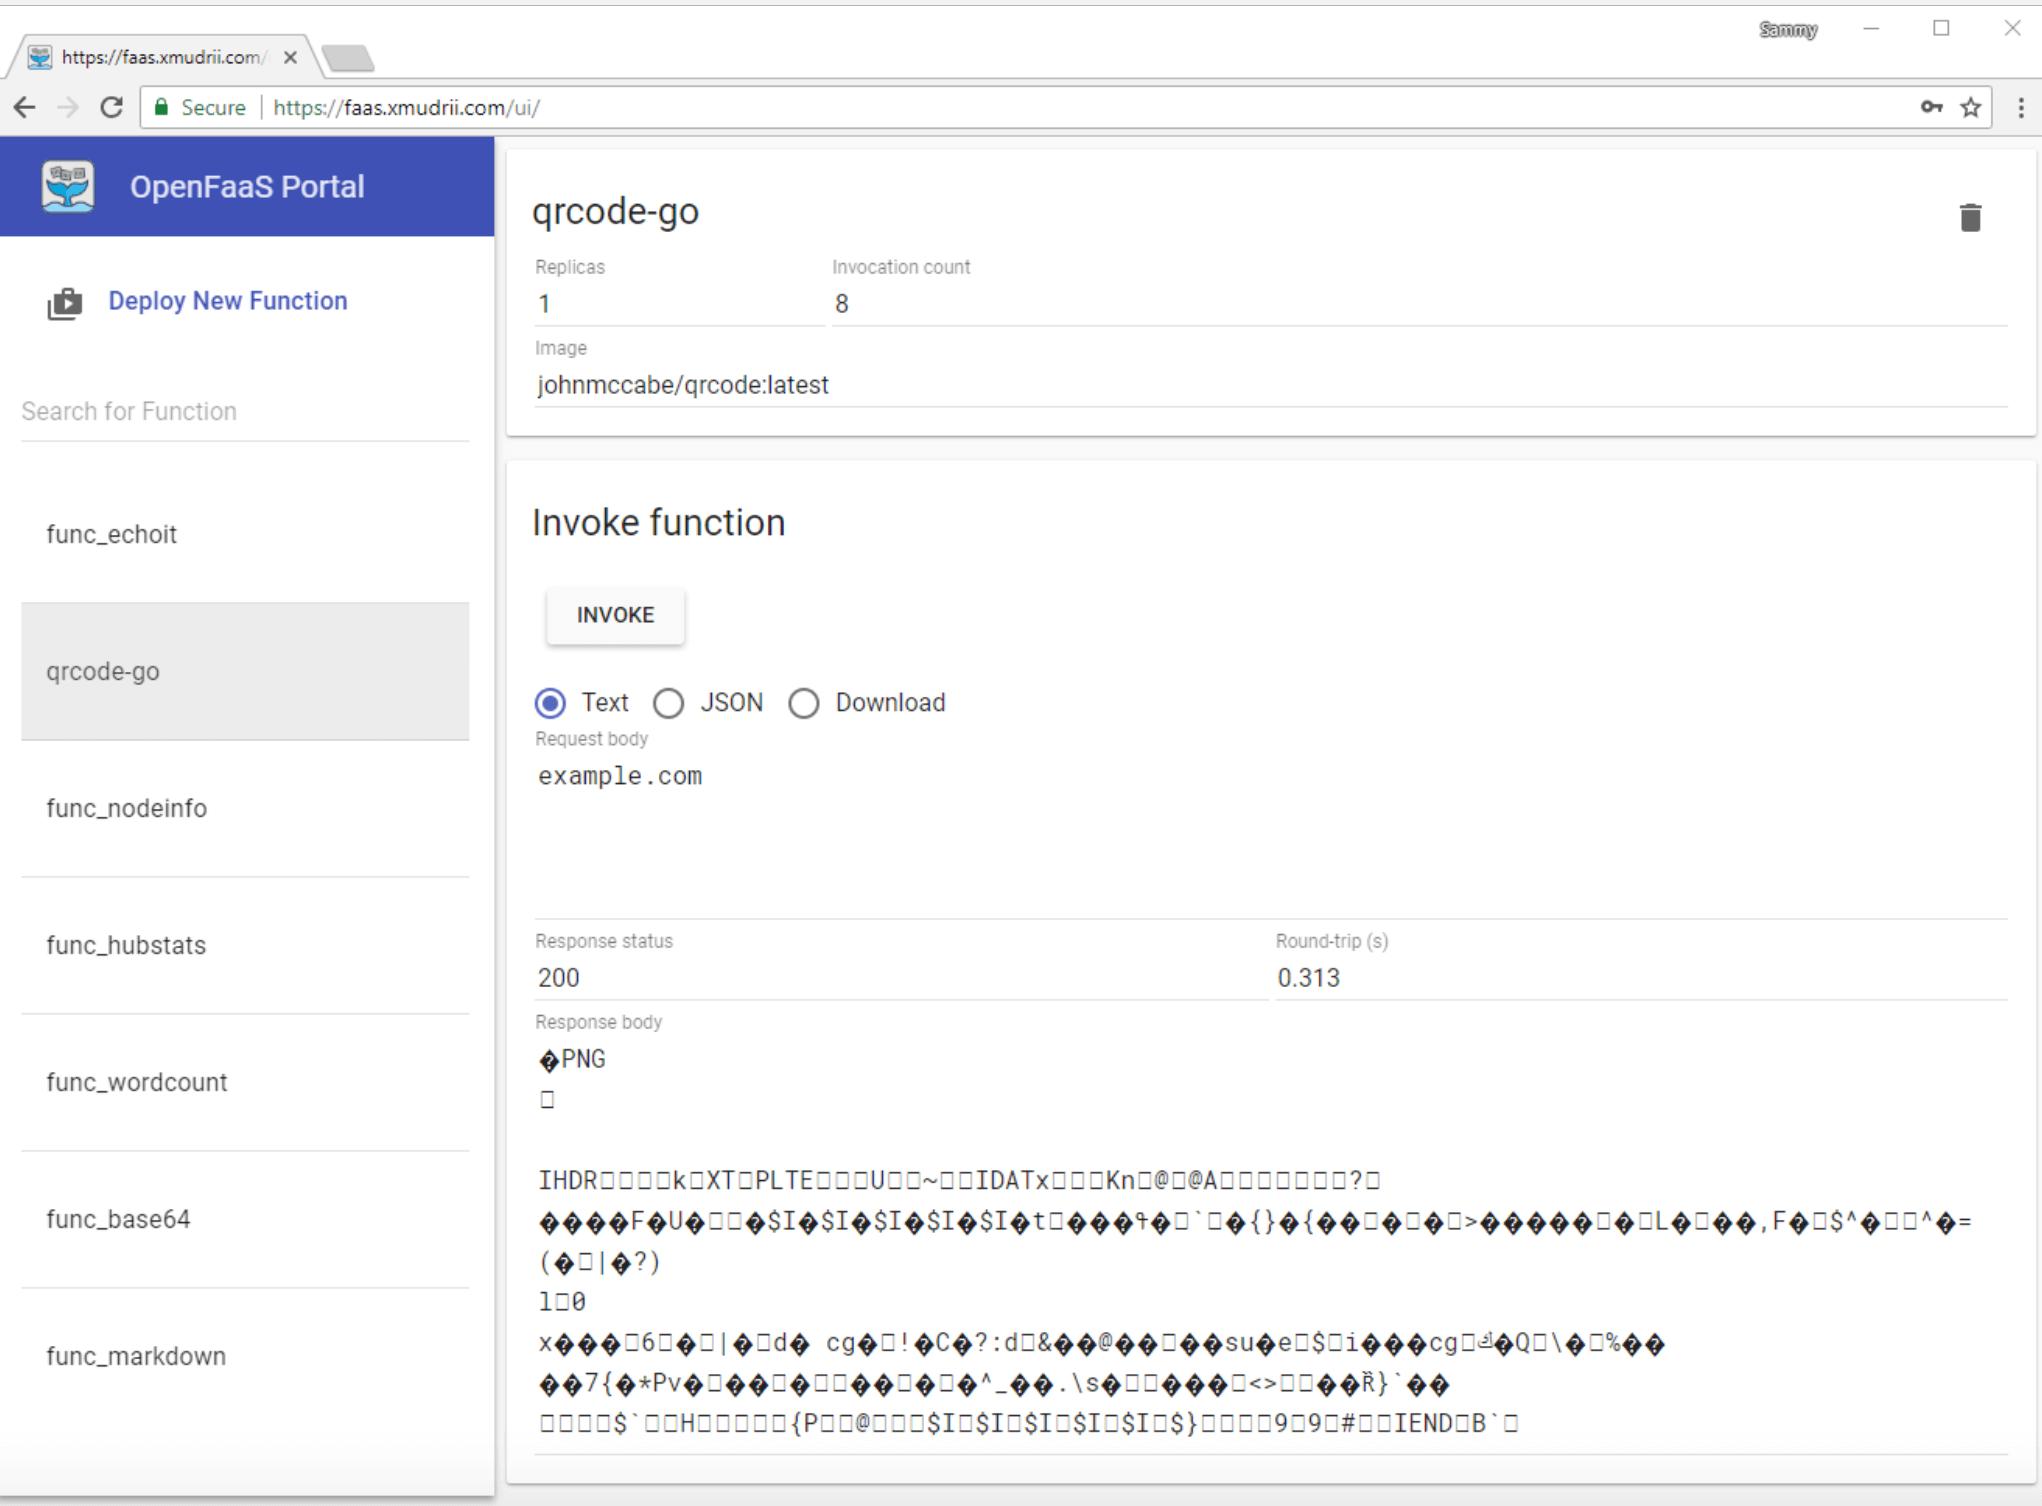 OpenFaaS generated QR code